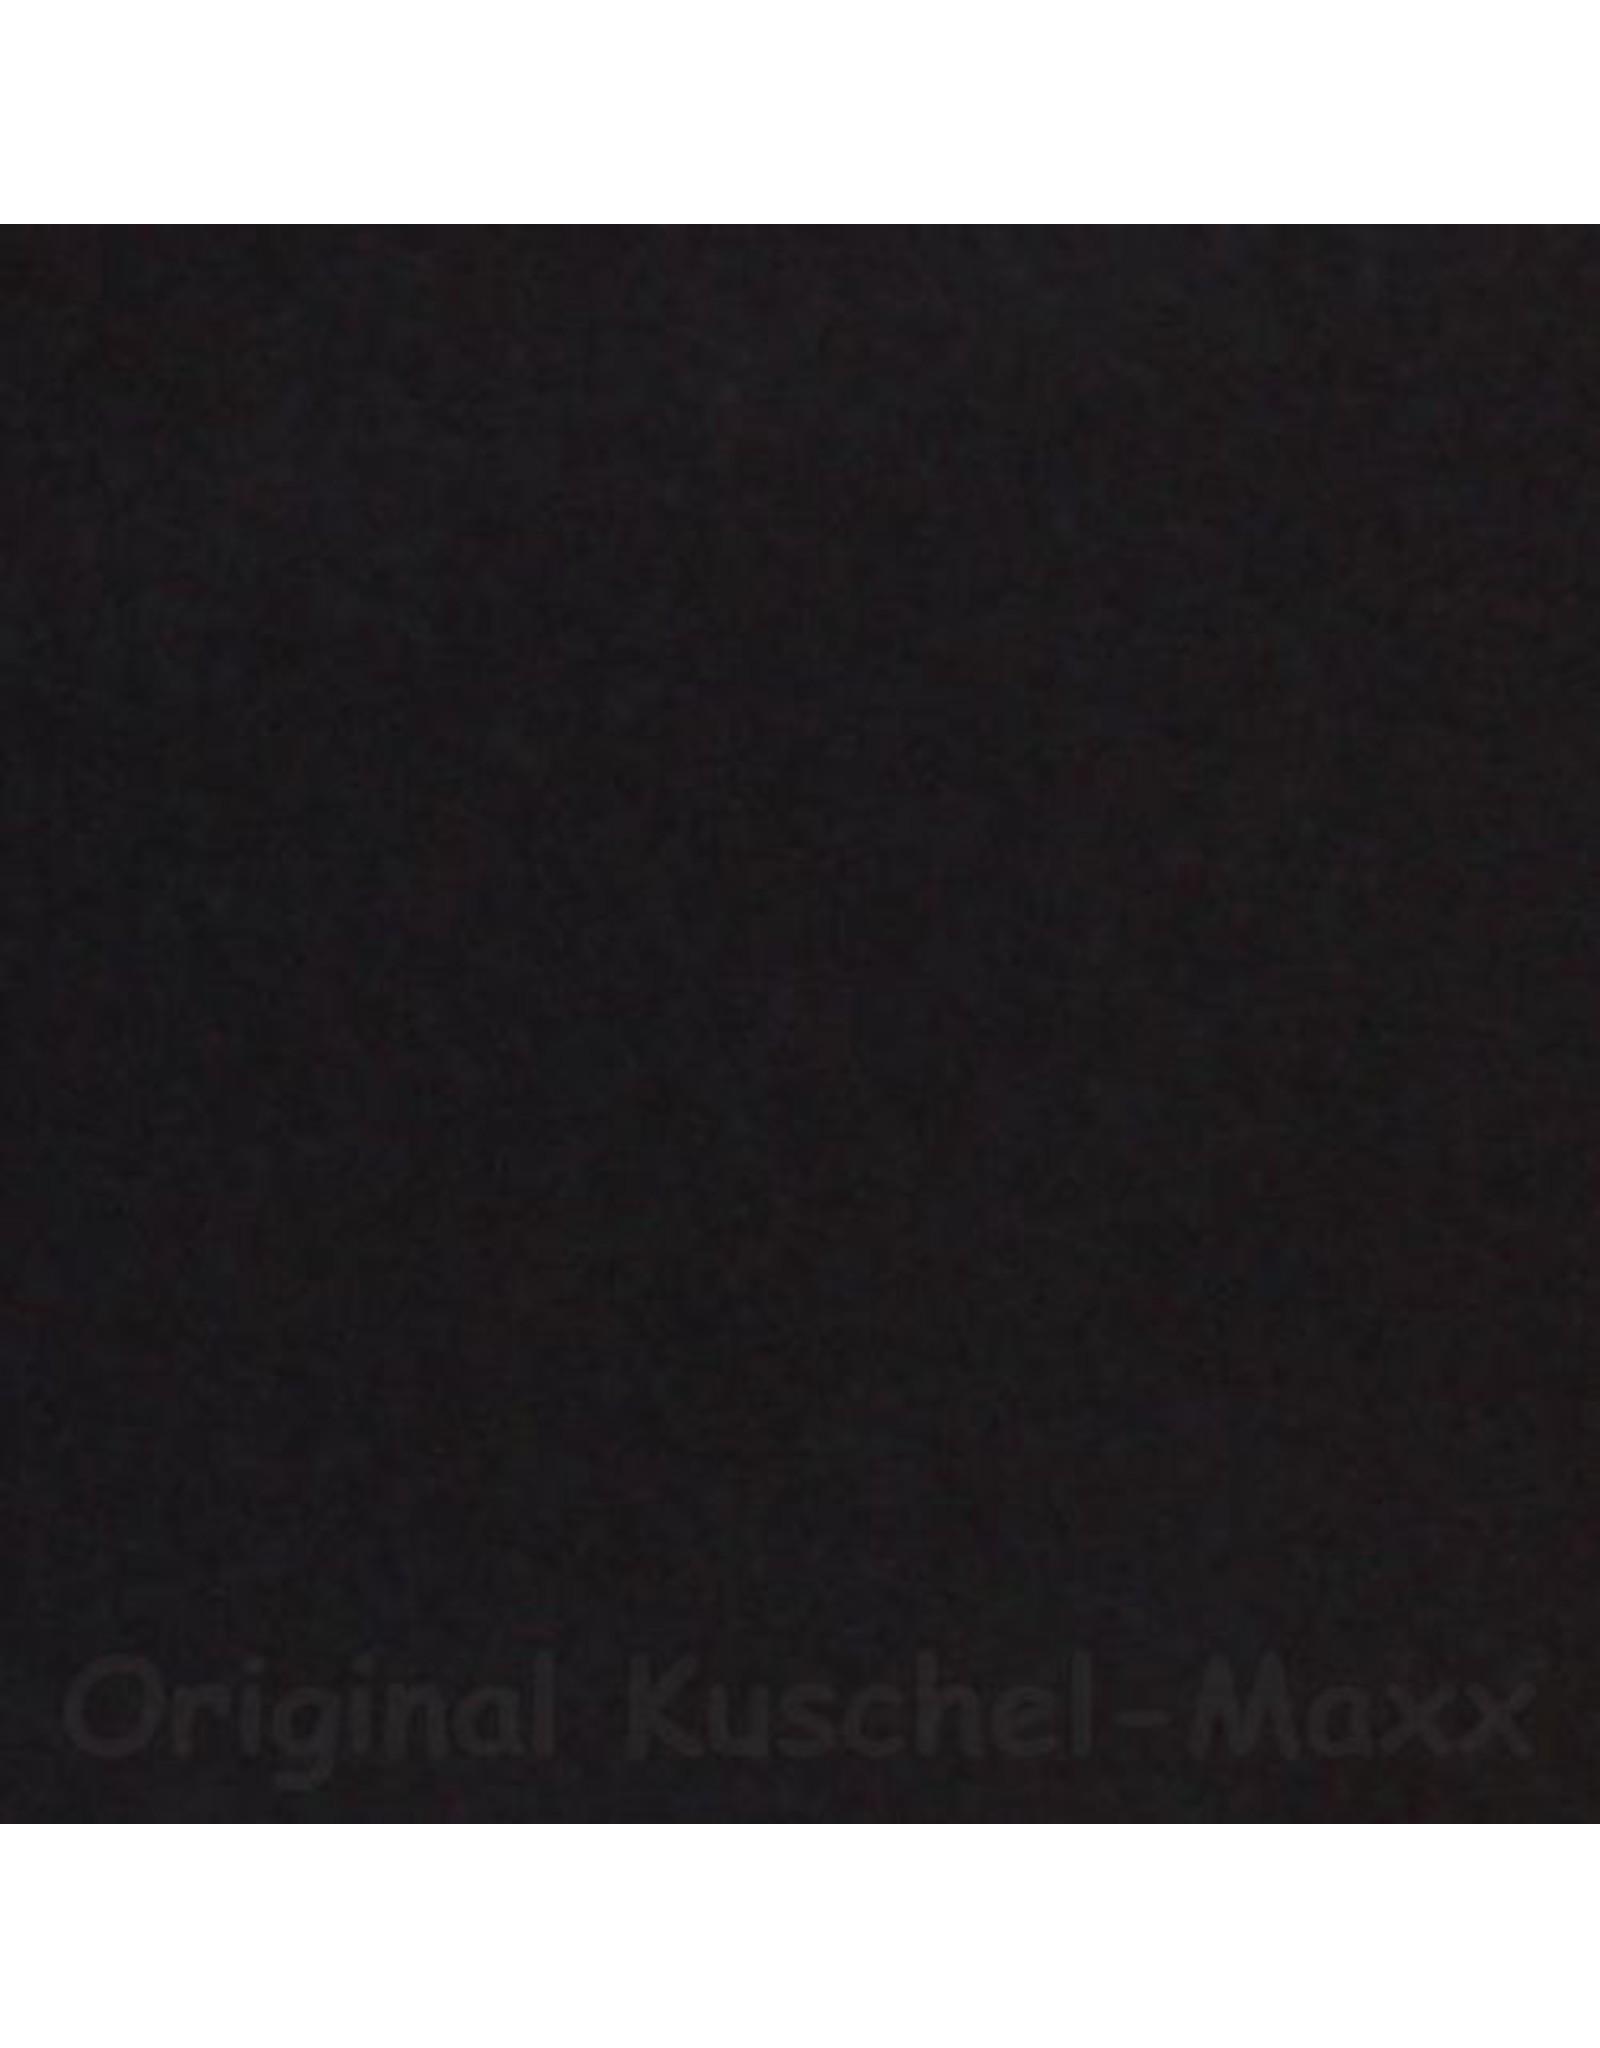 Kuschel-Maxx Kuschel-Maxx - Black